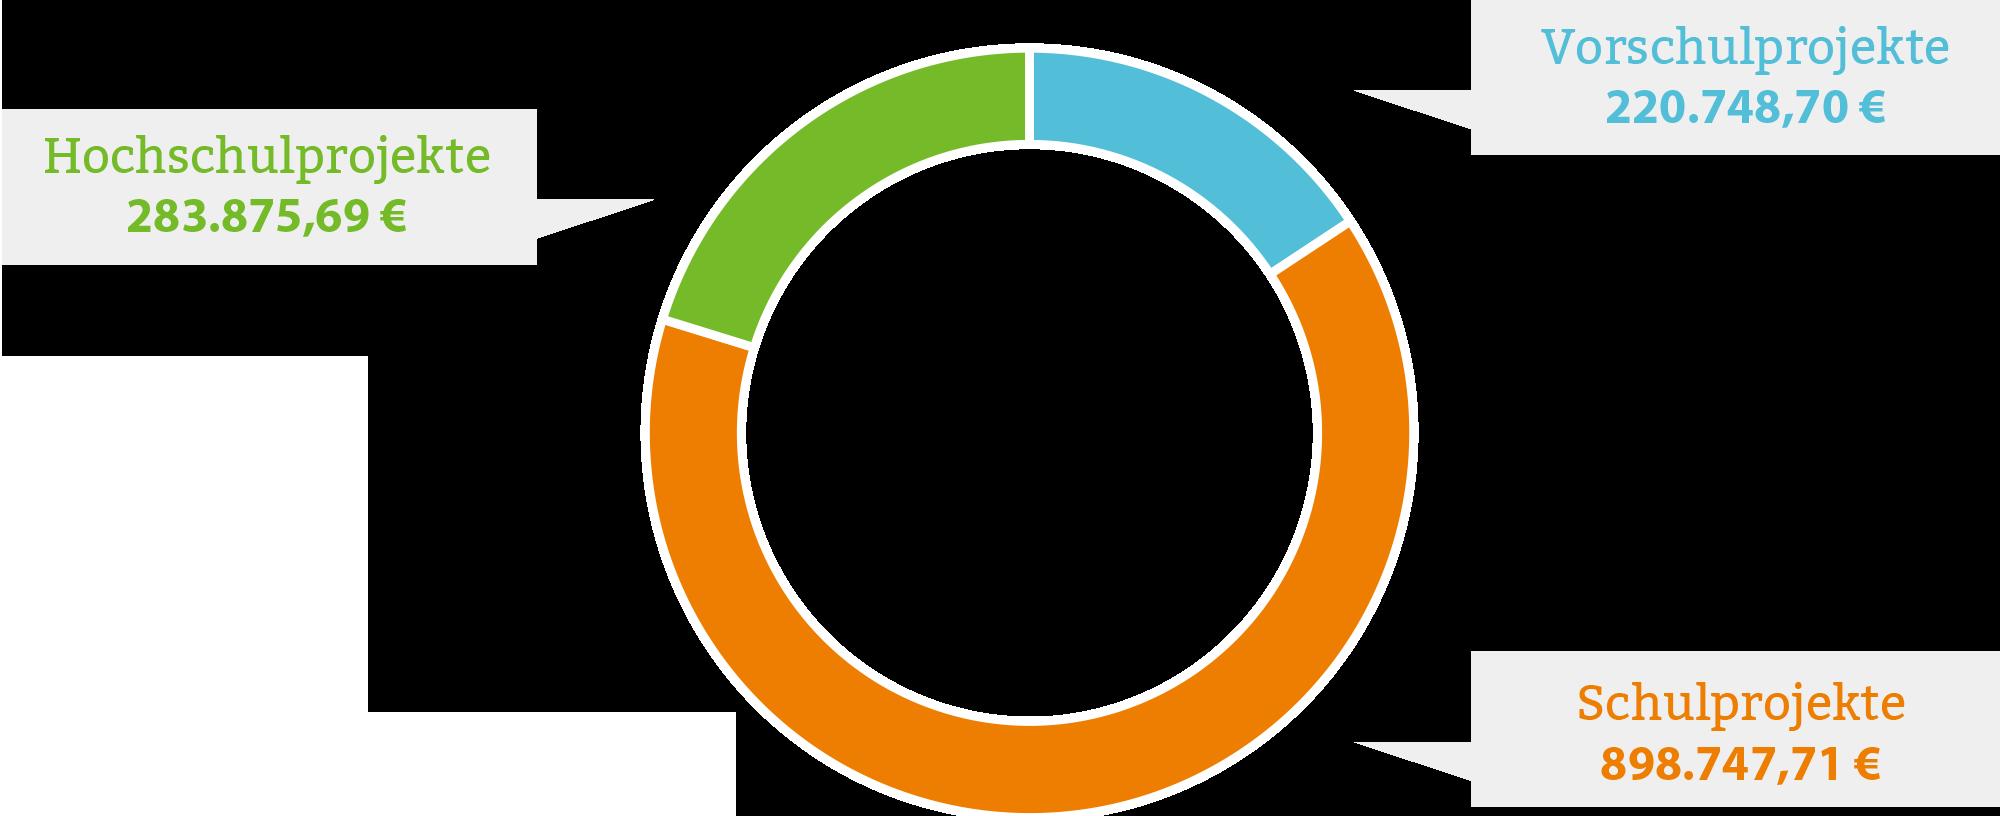 diagramm_projektbezogene_aufgaben